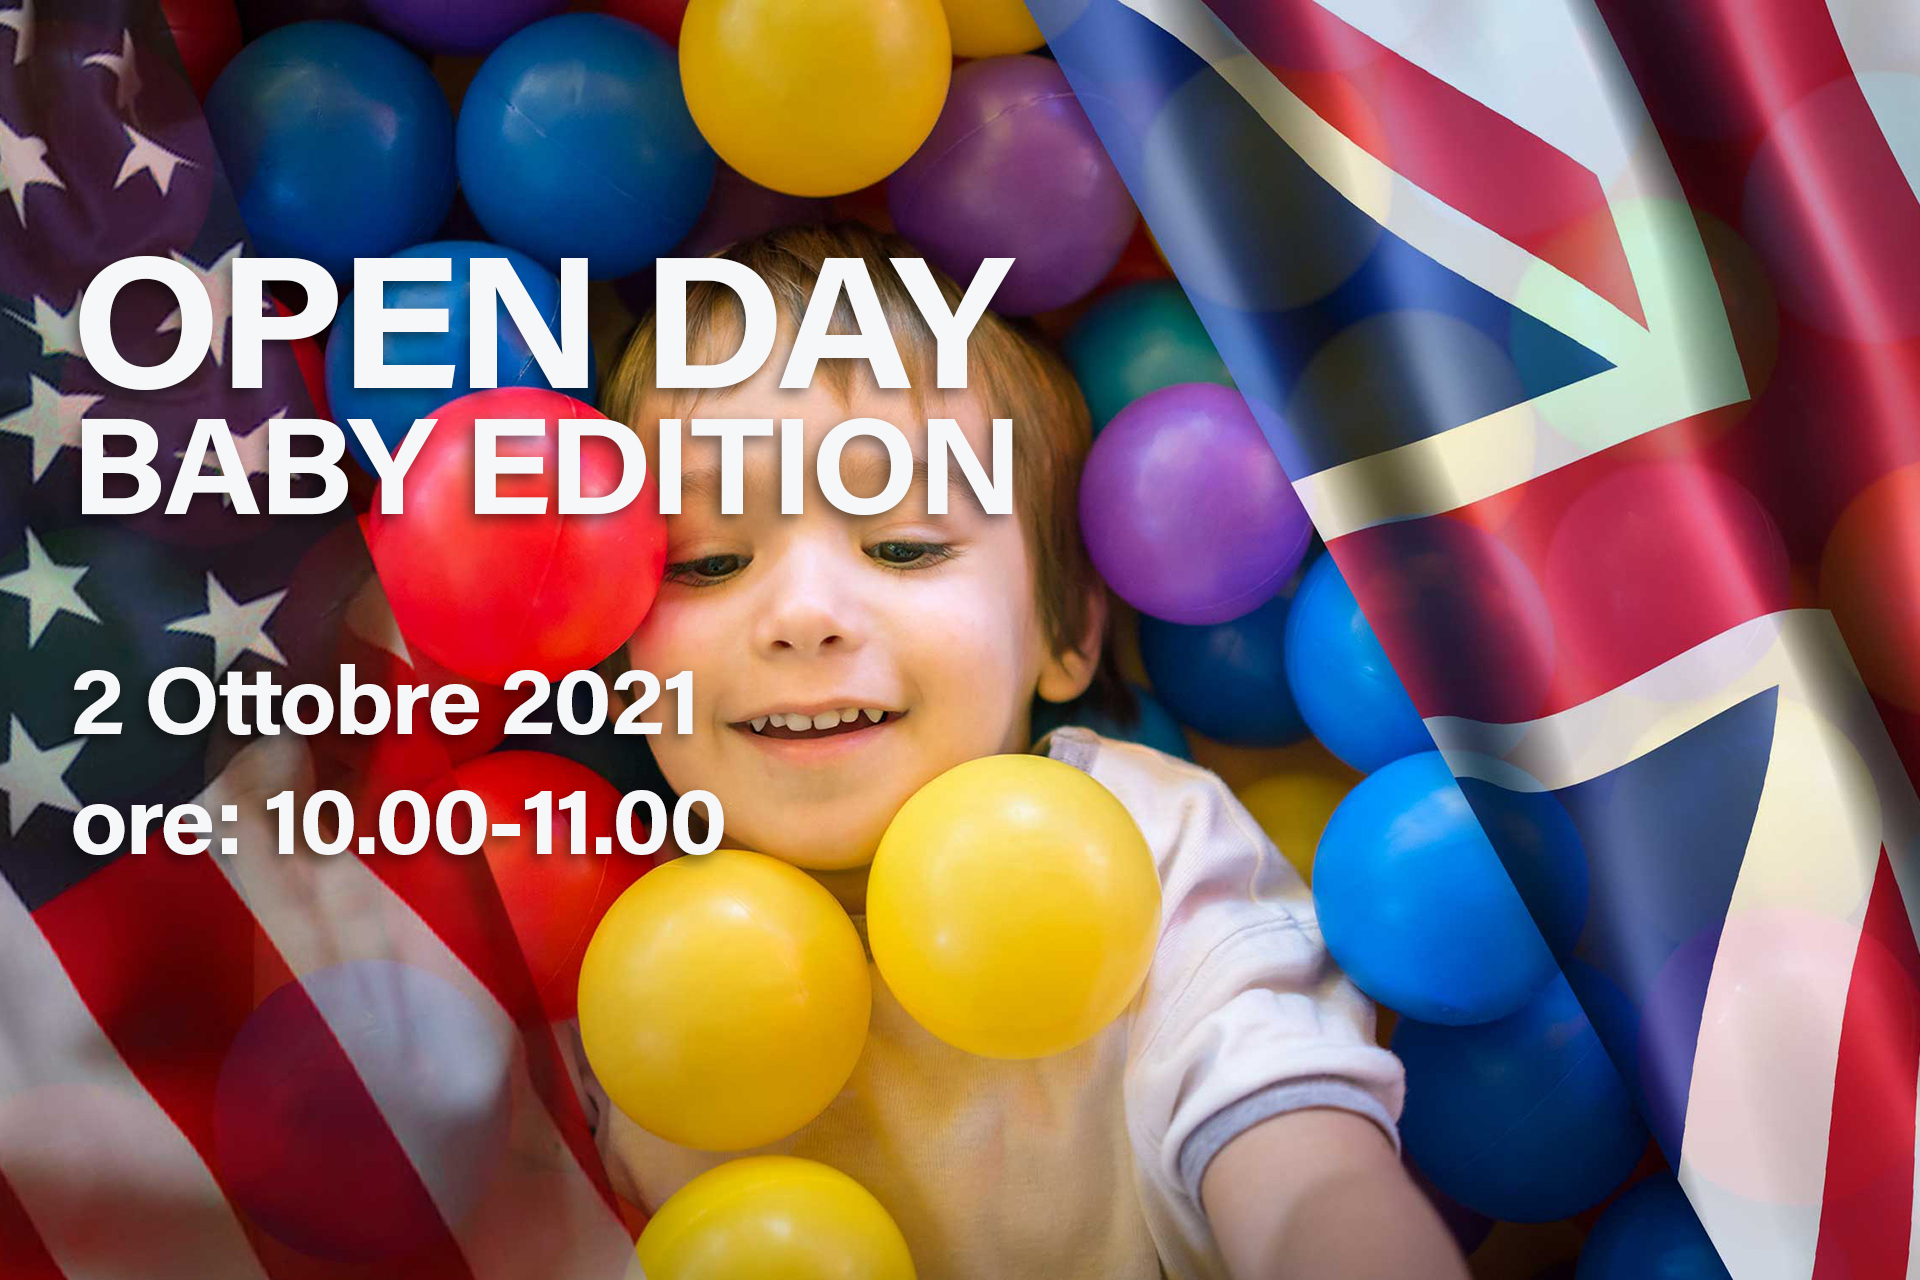 Hallo Open Day Baby Edition